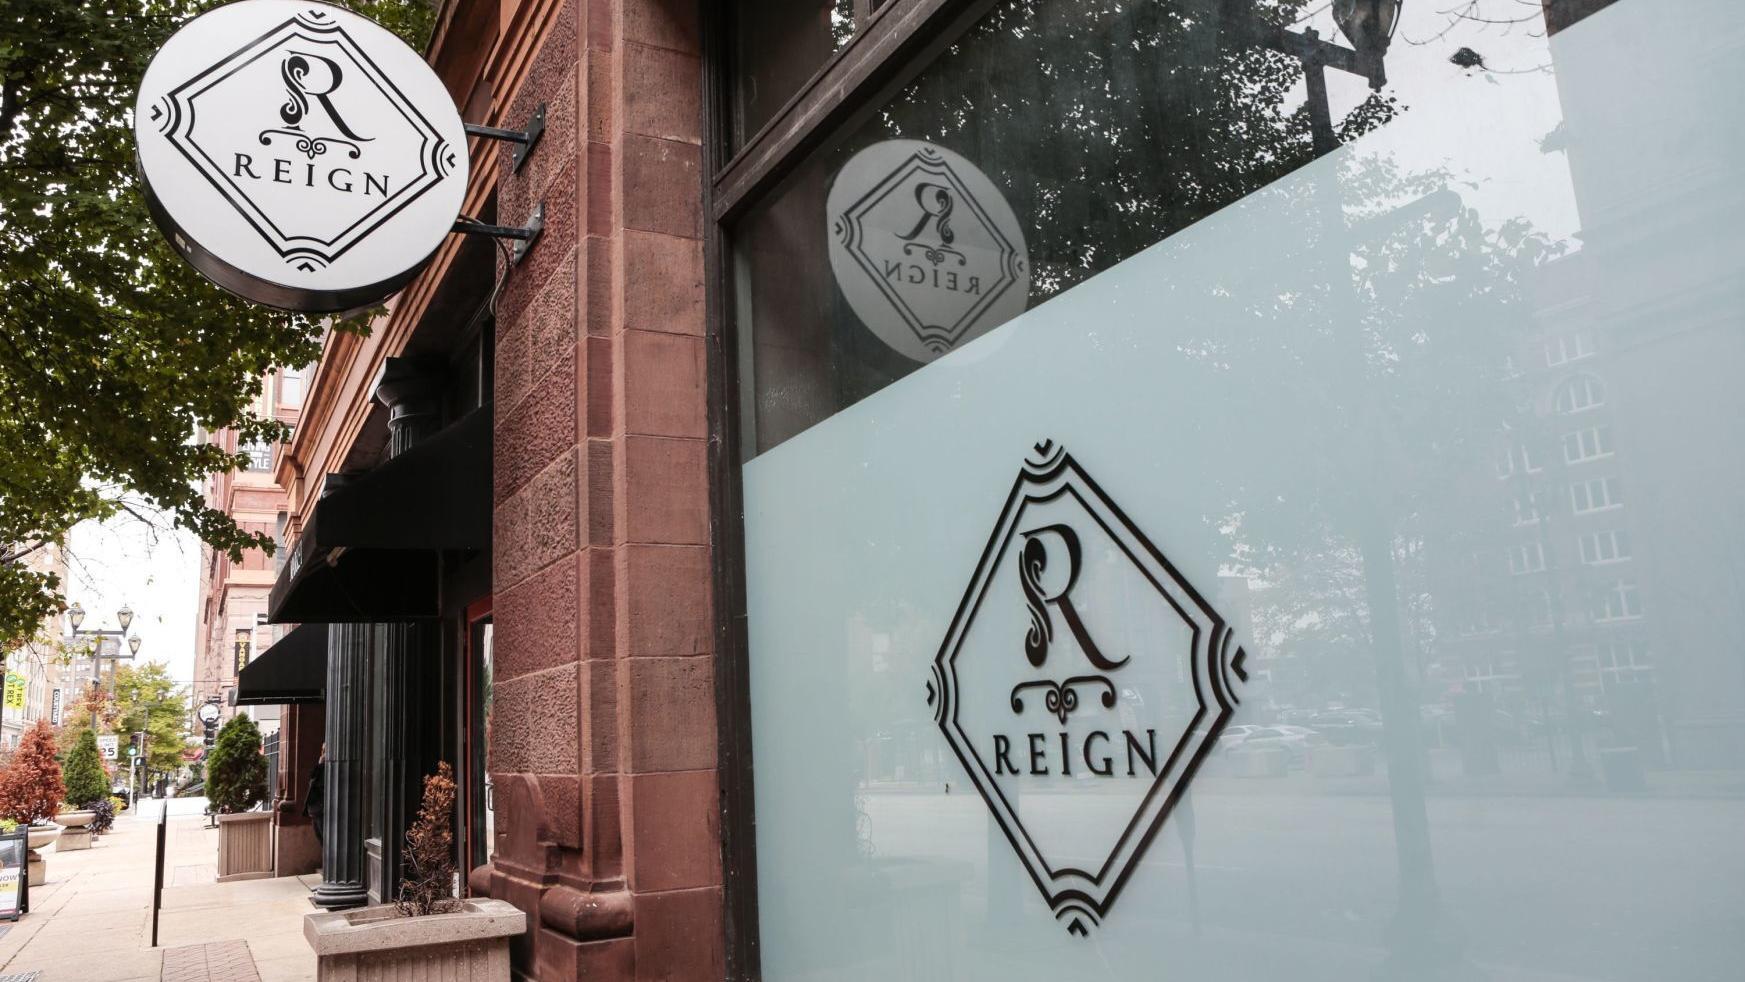 Reign Restaurant makes plea to health director after judge denies temporary restraining order